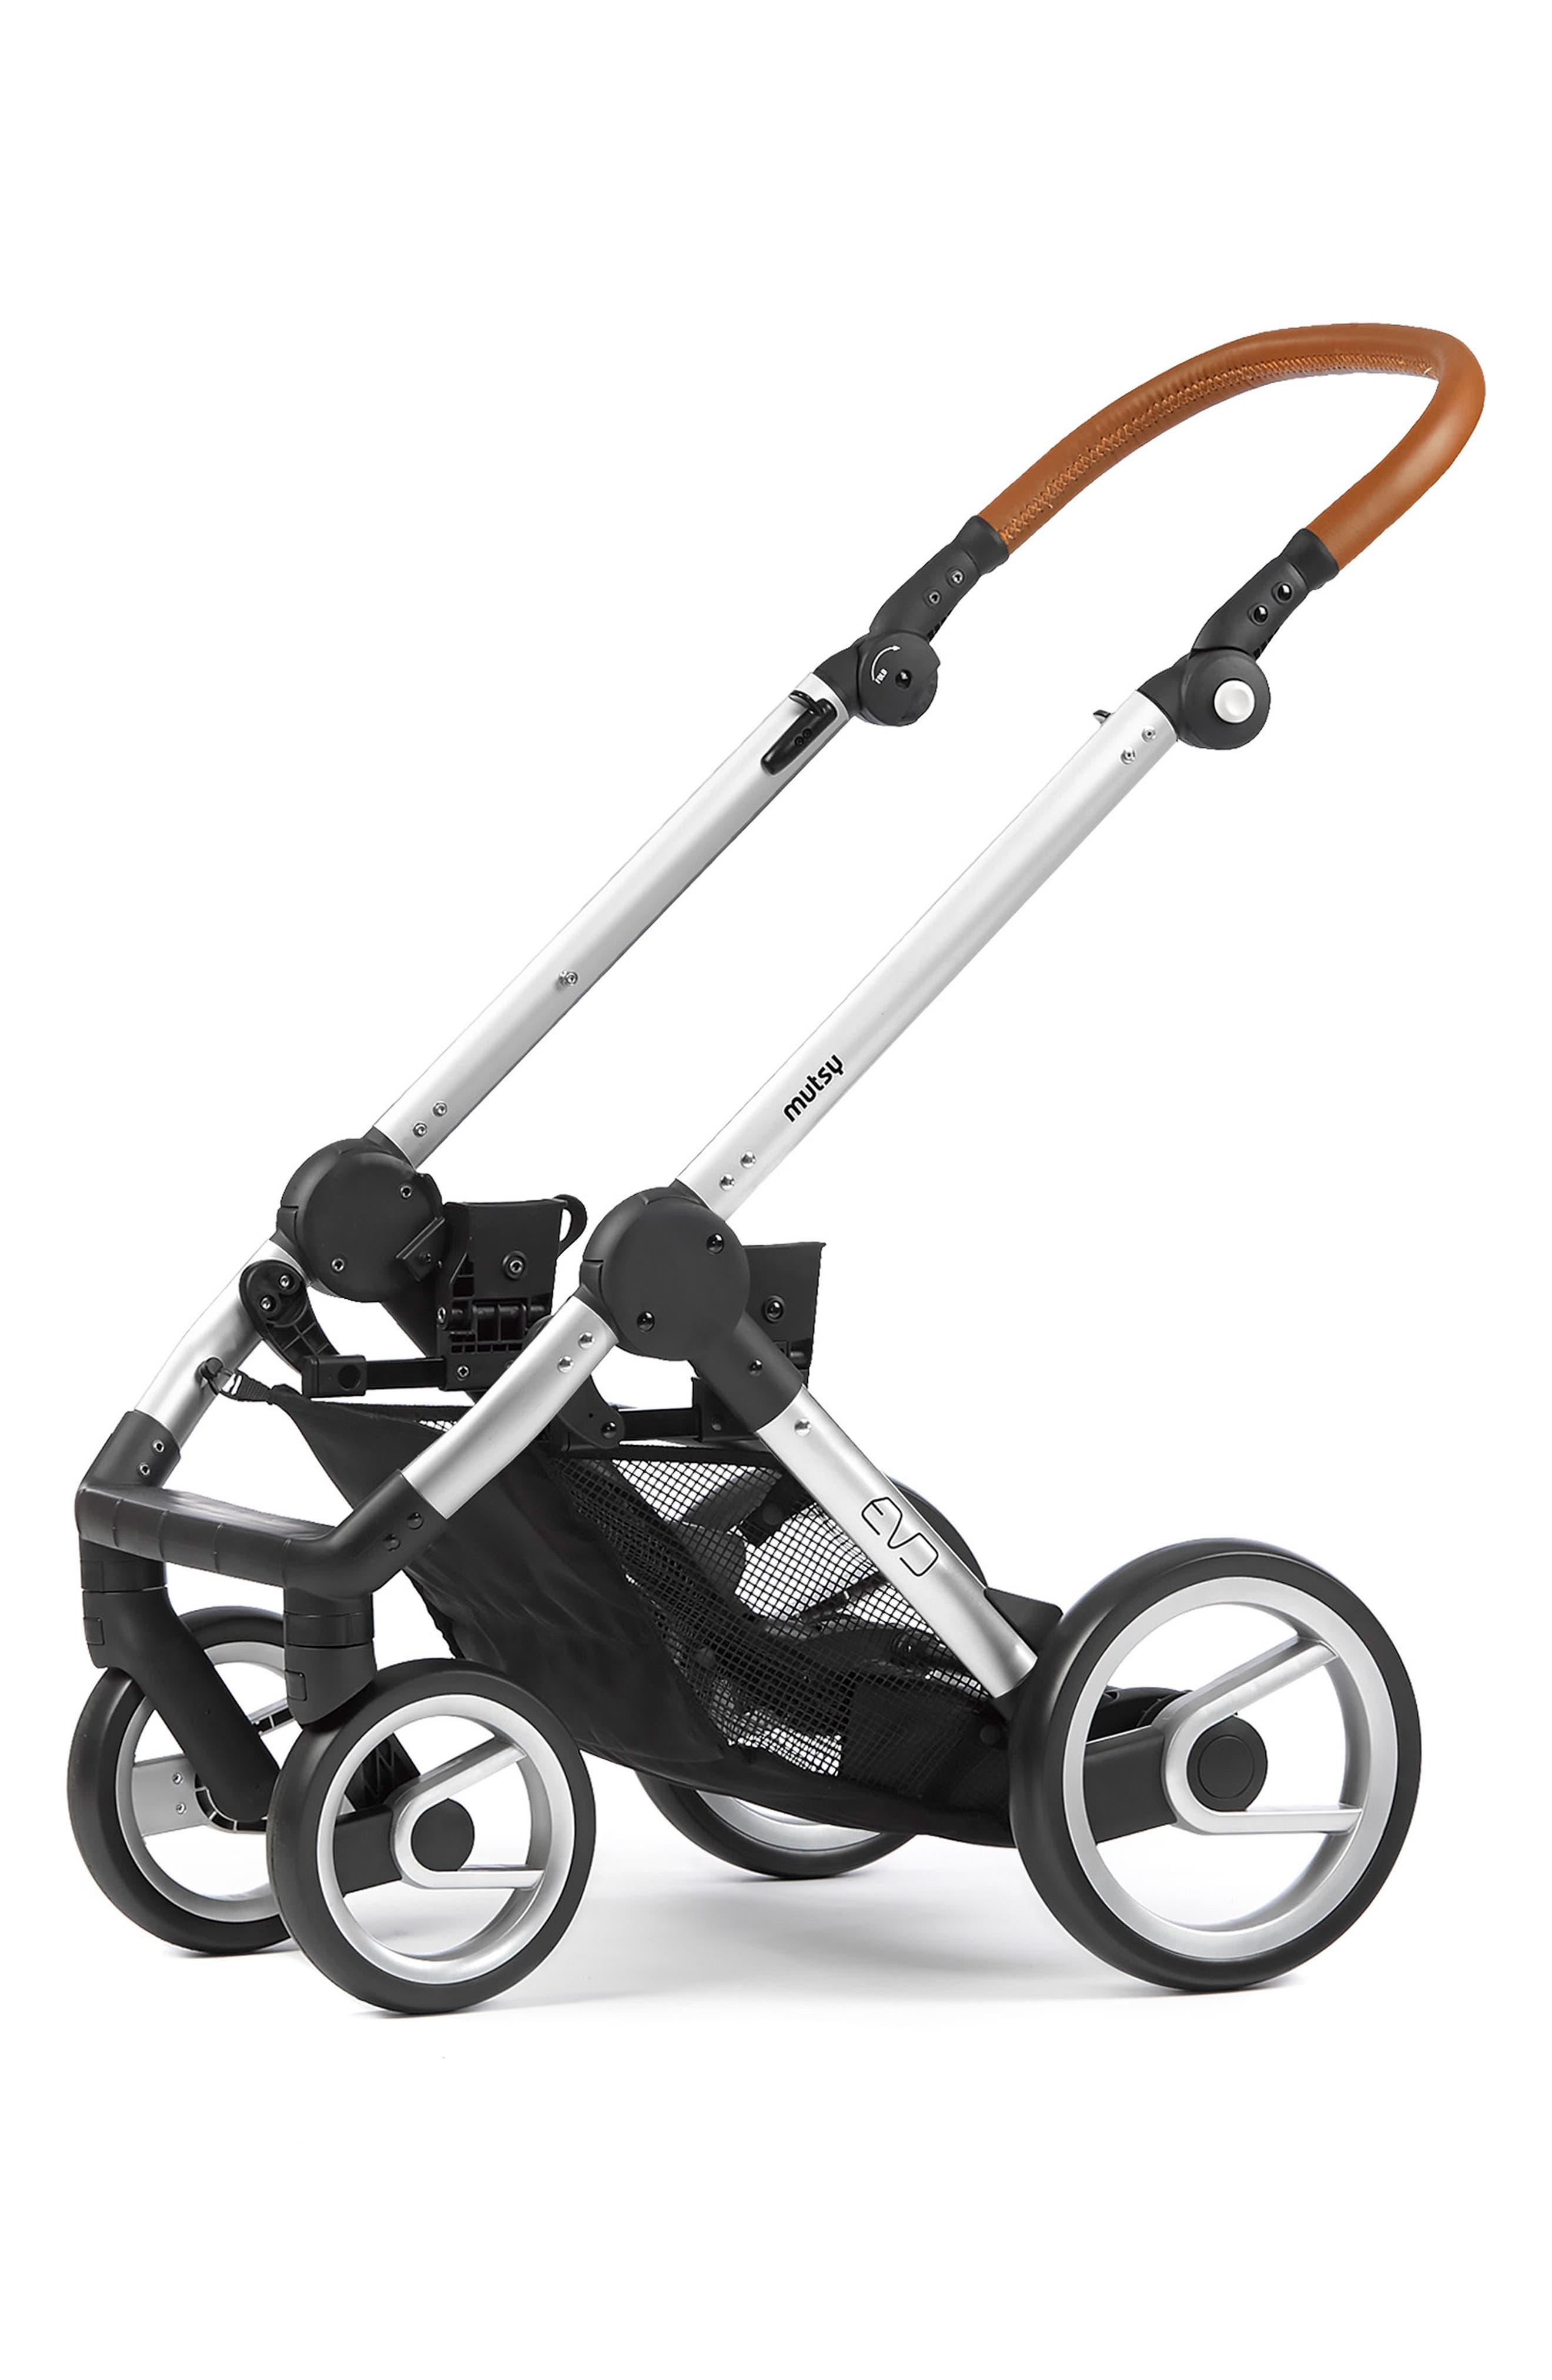 Evo - Urban Nomad Stroller,                             Alternate thumbnail 2, color,                             040